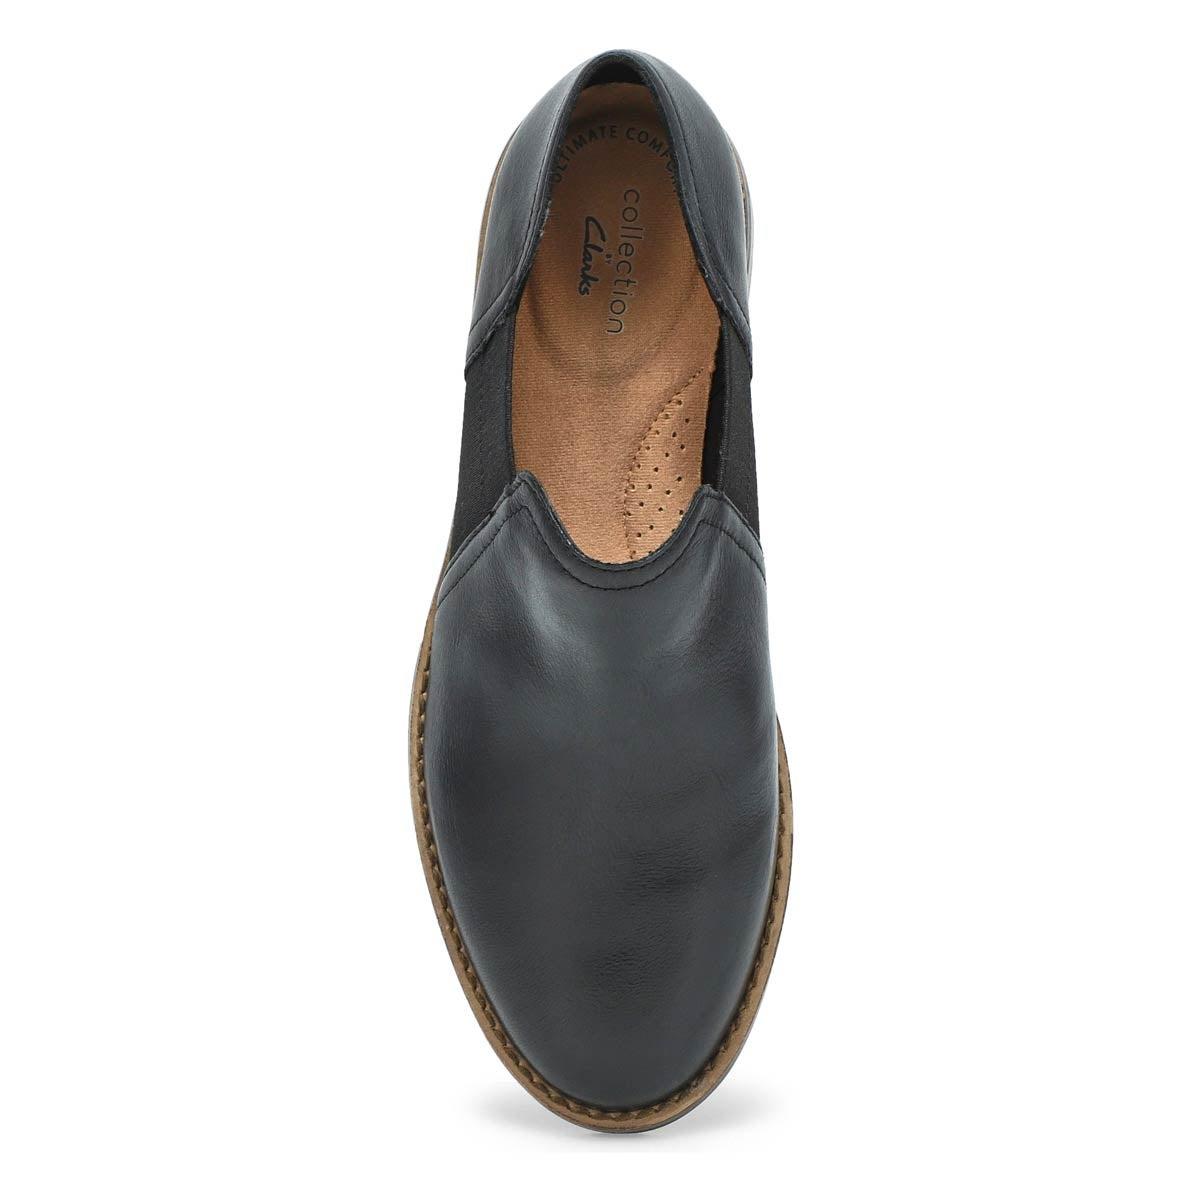 Chaussure Camzin Step, noir, femme - Large